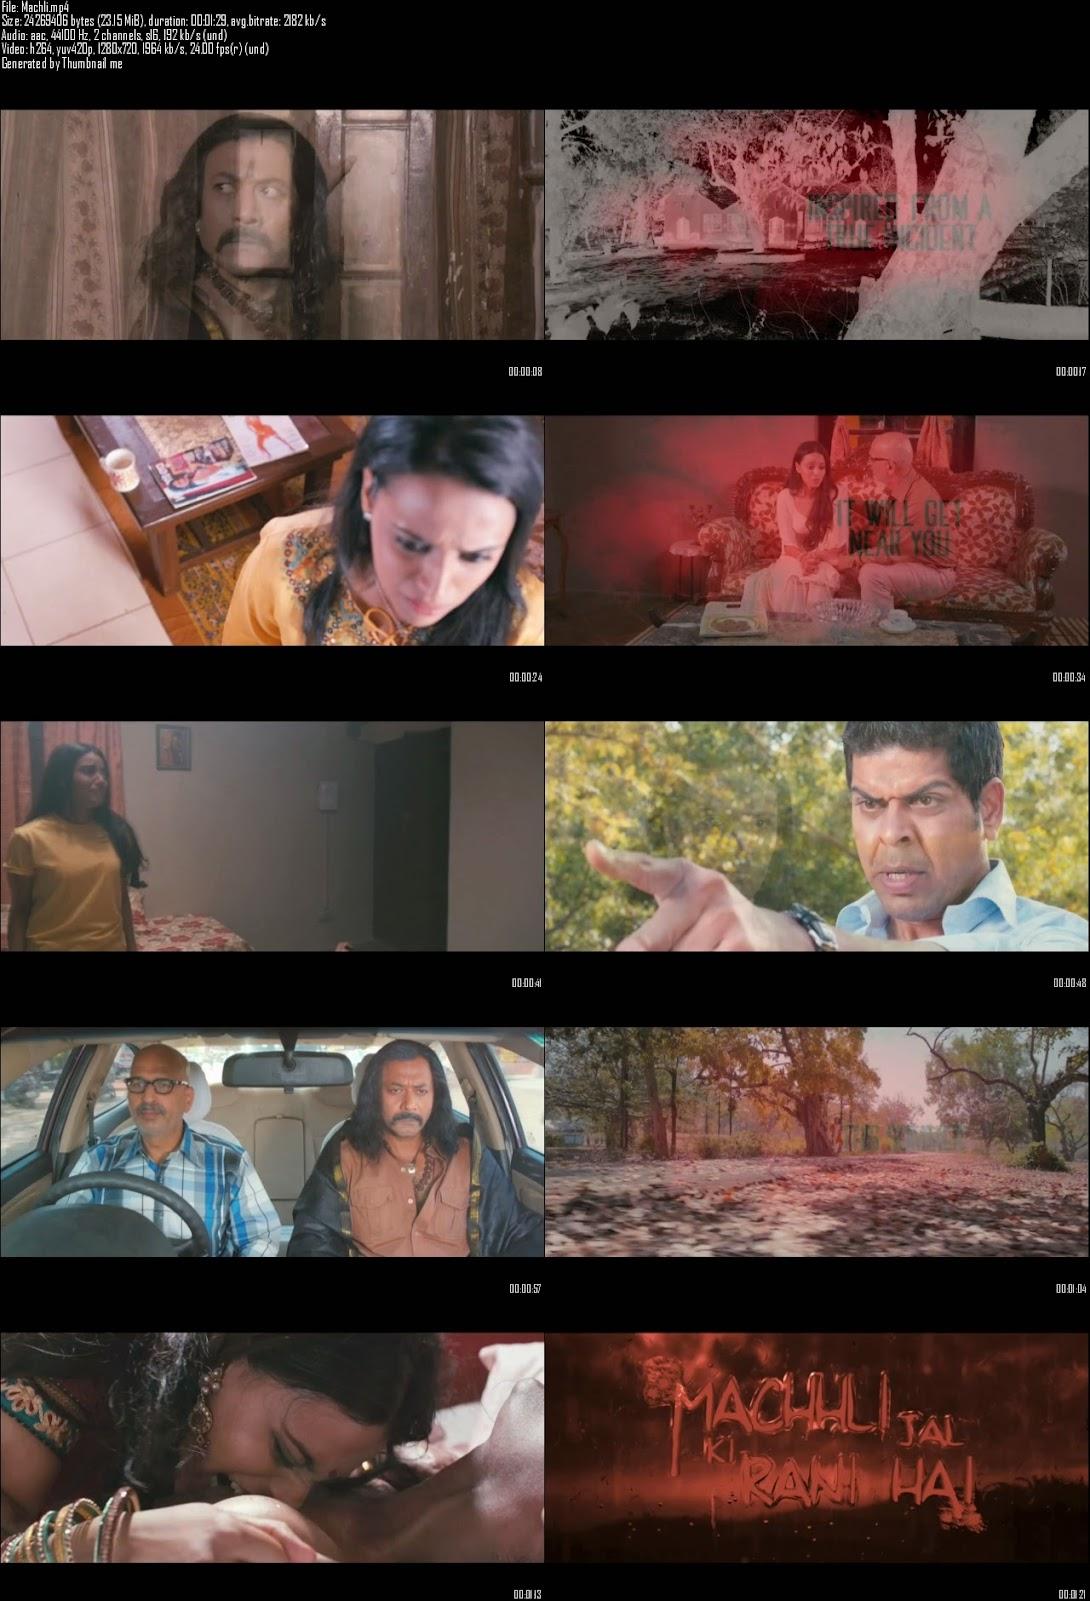 Mediafire Resumable Download Link For Teaser Promo Of Machhli Jal Ki Rani Hai (2014)